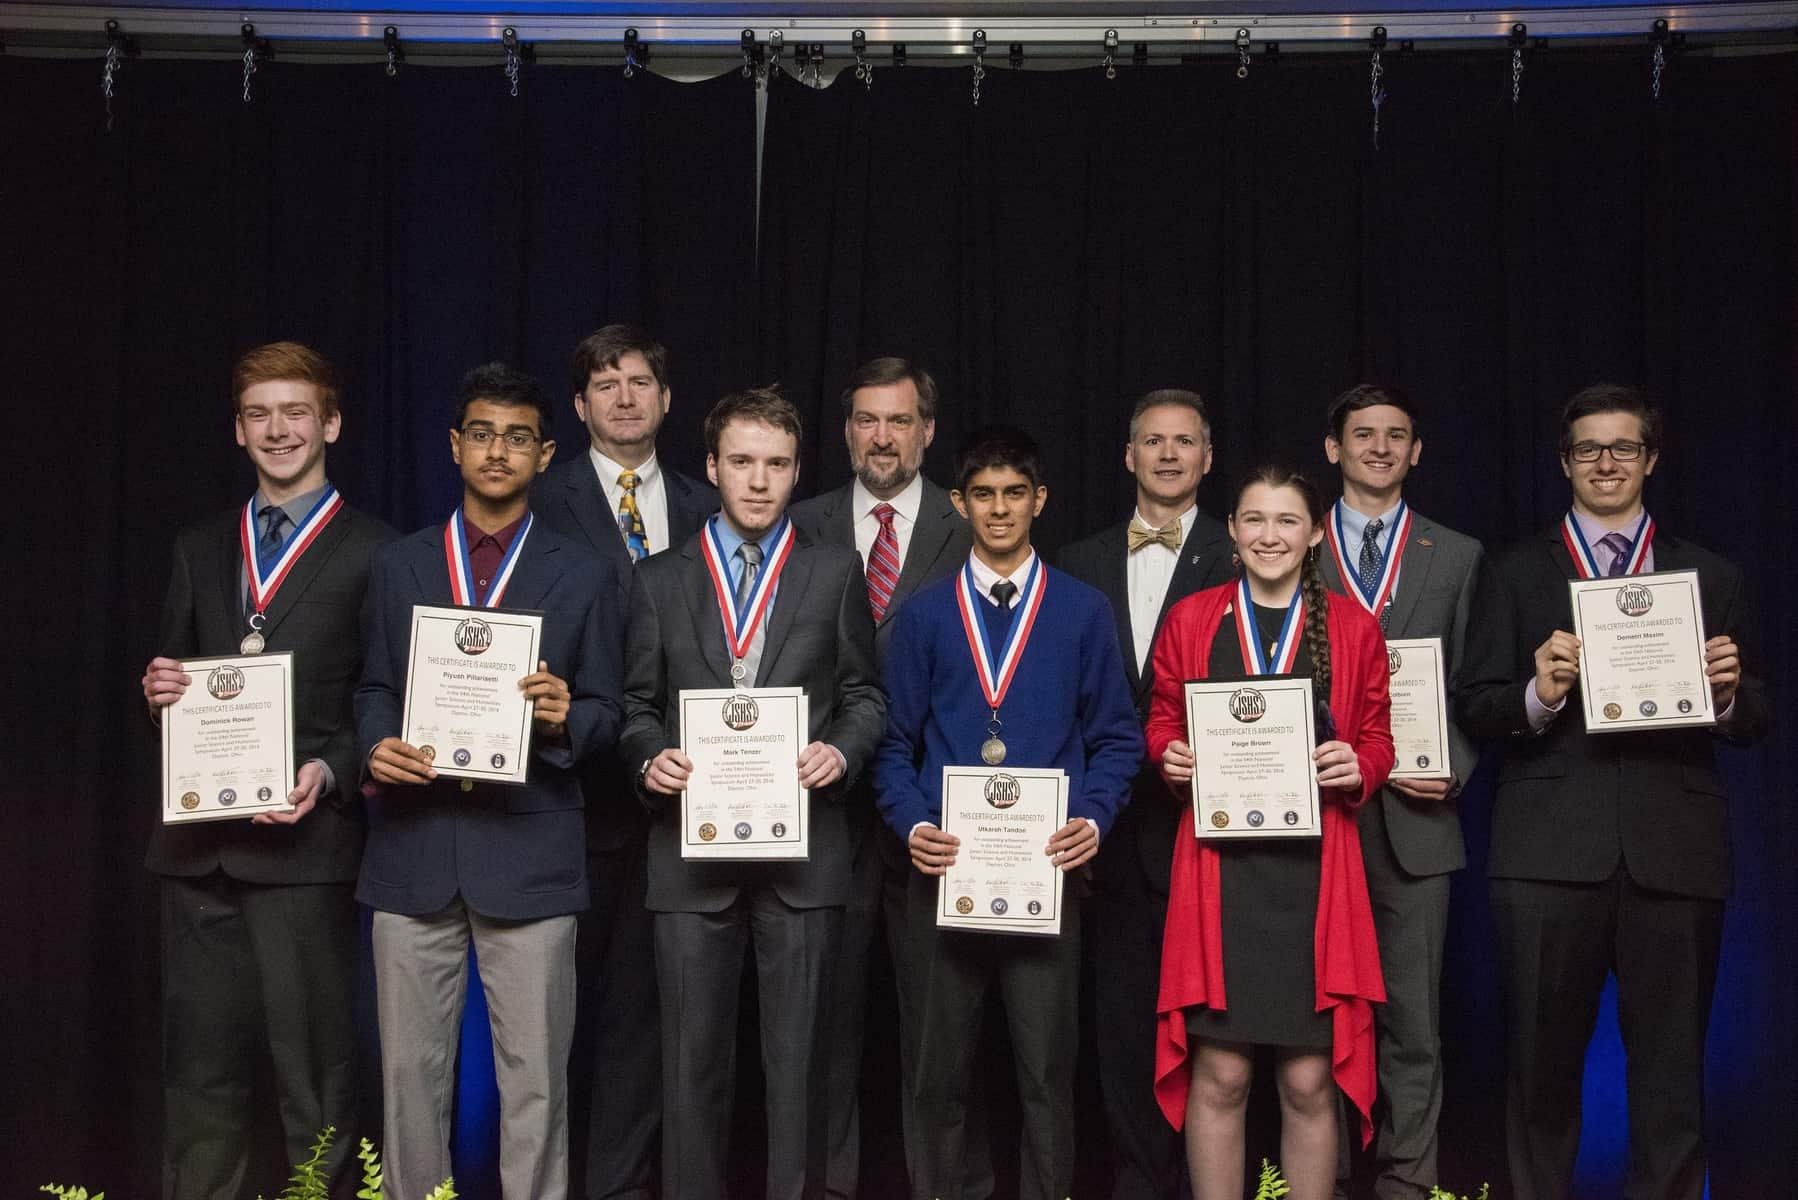 Essay contests for high school juniors 2011